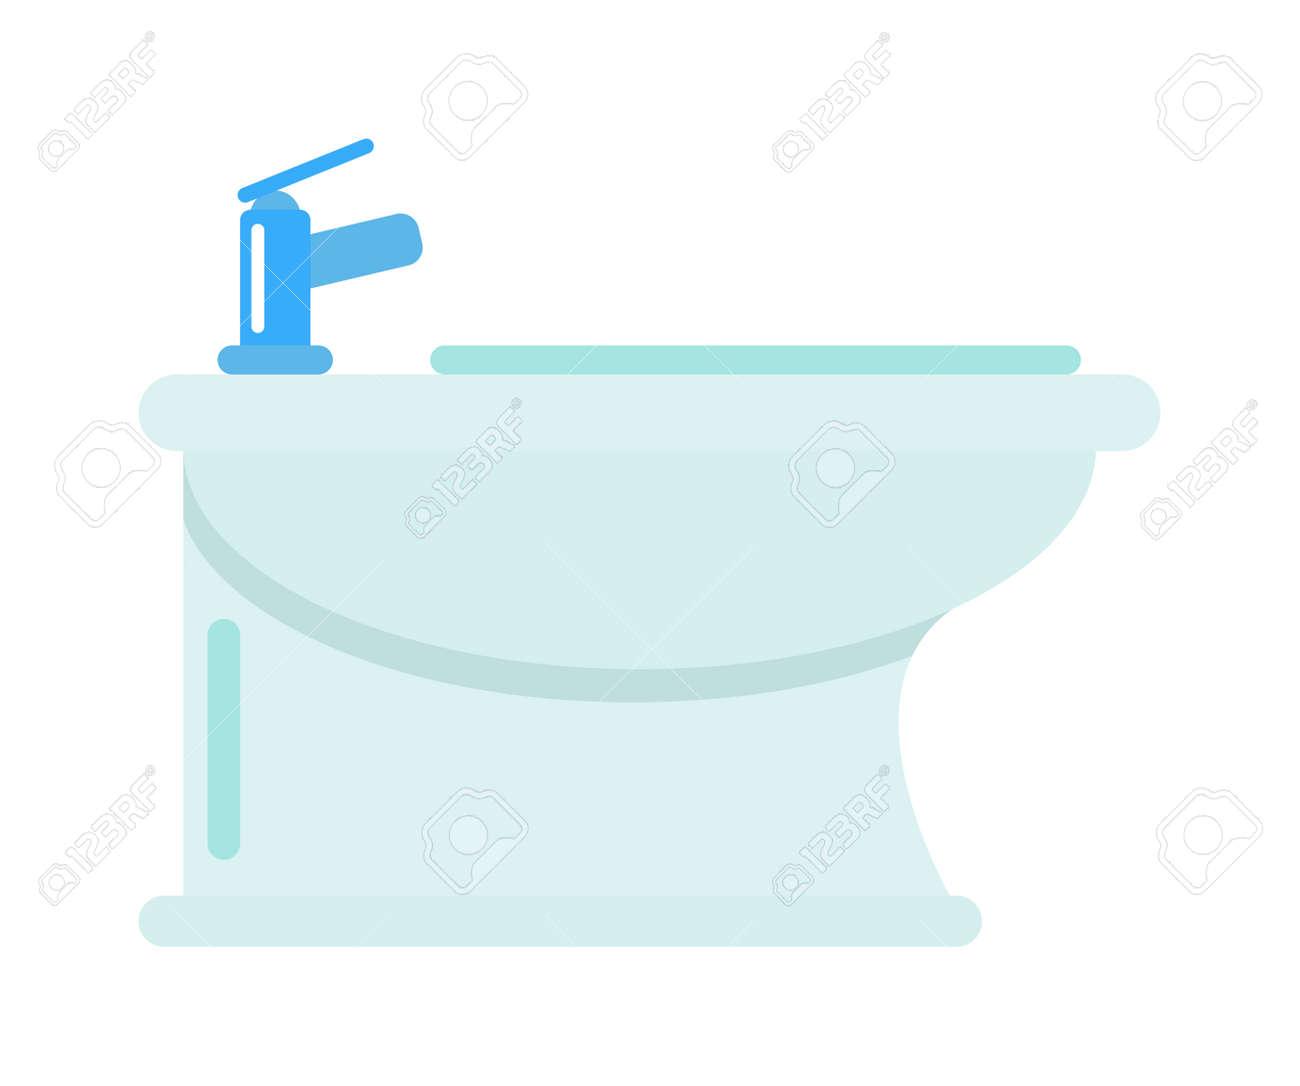 Unusual Replace Bathroom Fan Light Bulb Tall Lowe S Canada Bathroom Cabinets Shaped Bathtub Grout Repair Total Bathroom Remodel Young Remodel Bathroom Vanity Top DarkBest Bathroom Designs 2013 Bathroom Water Closet